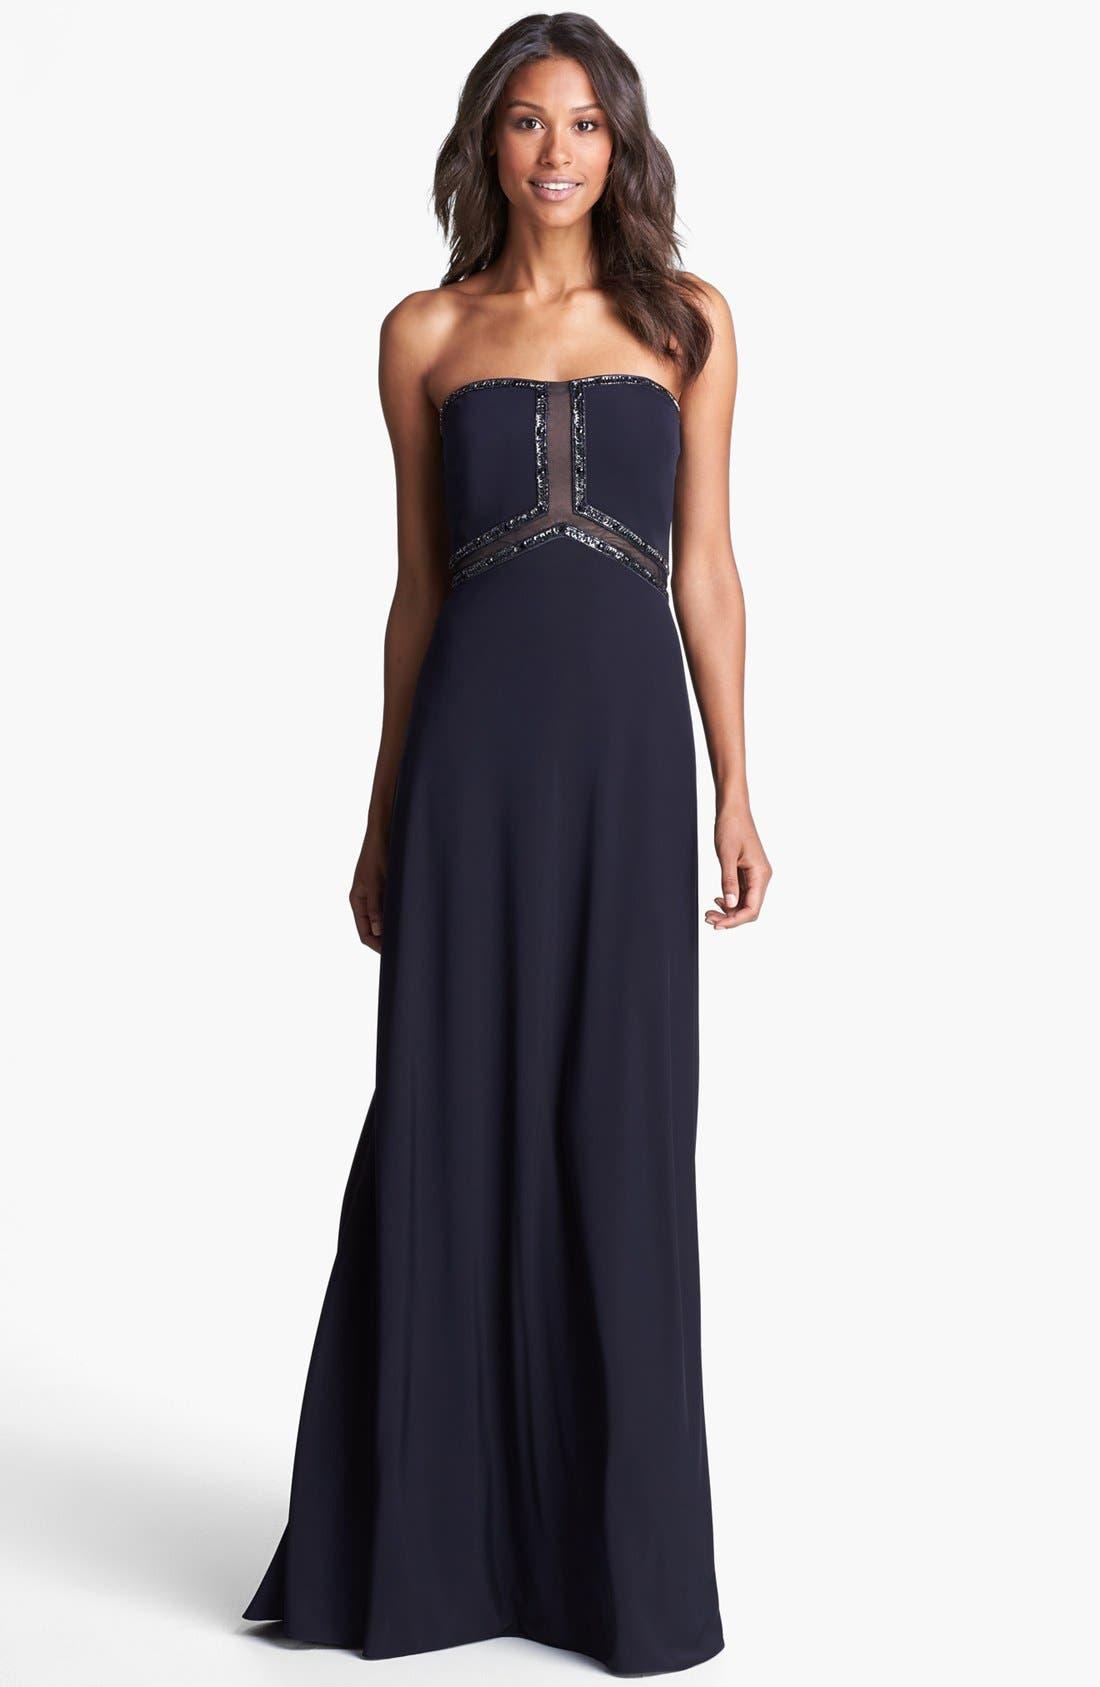 Alternate Image 1 Selected - Aidan Mattox Embellished Mesh Inset Dress